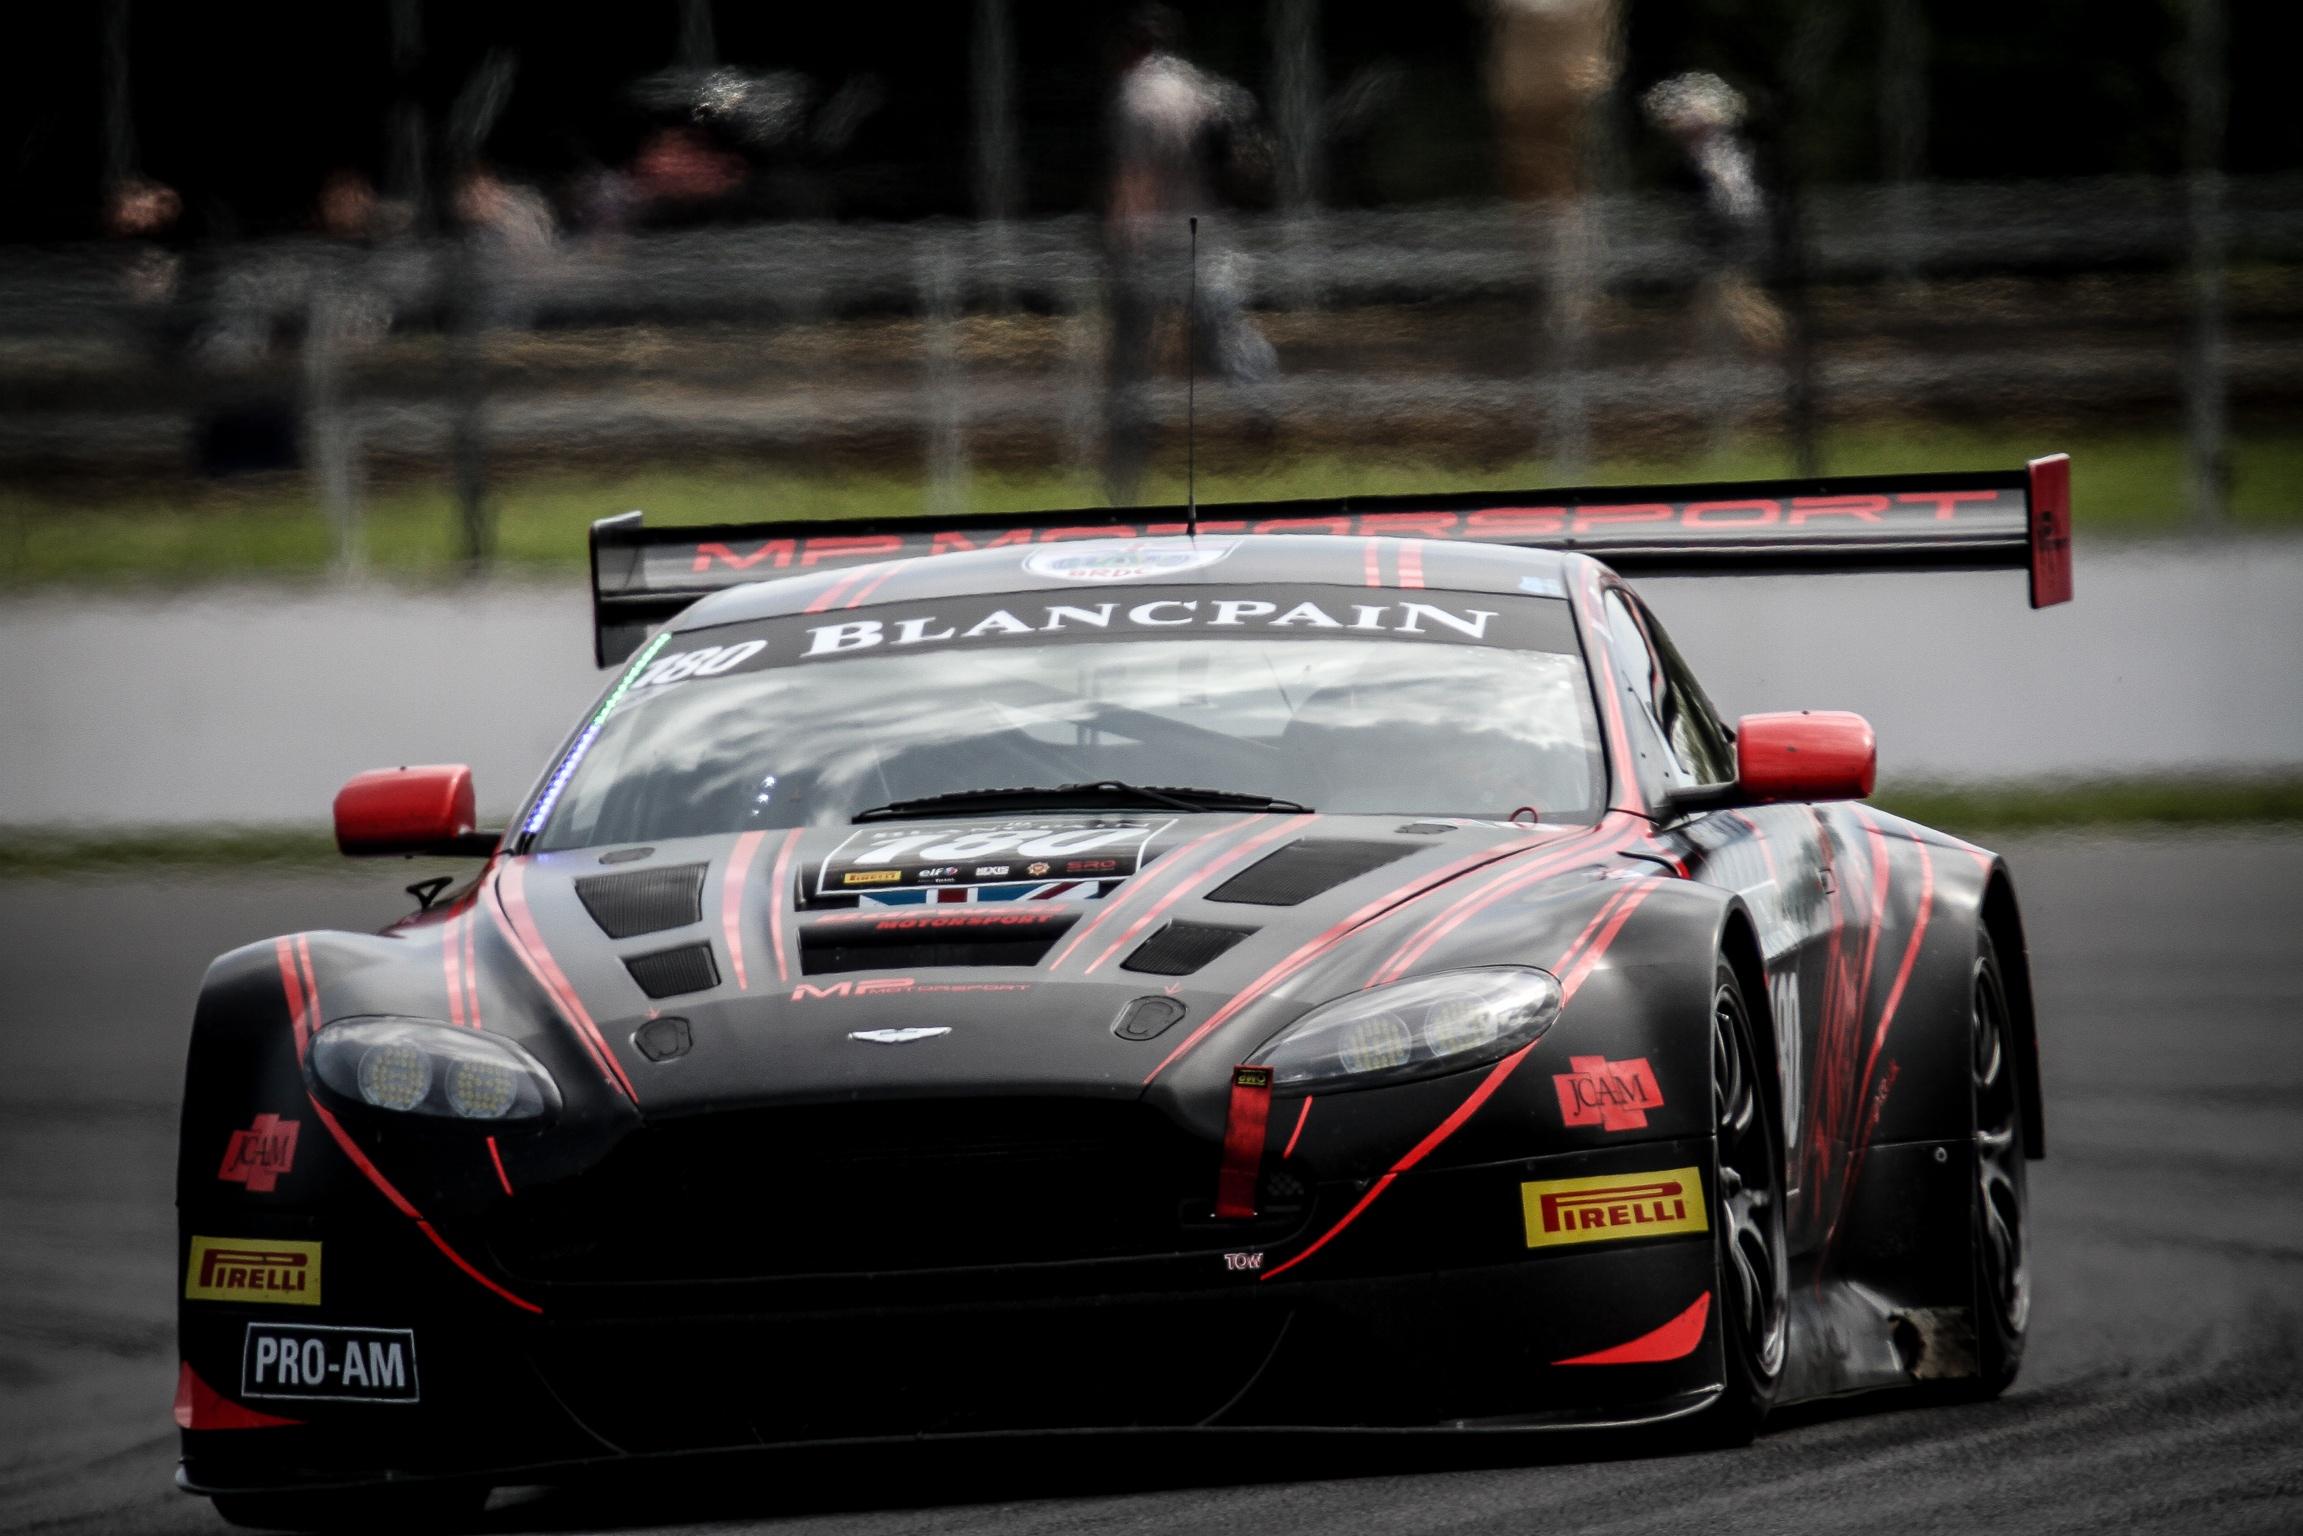 Aston Martin V12 Vantage Gt3 Barwell To Contest Barcelona 24 Hours